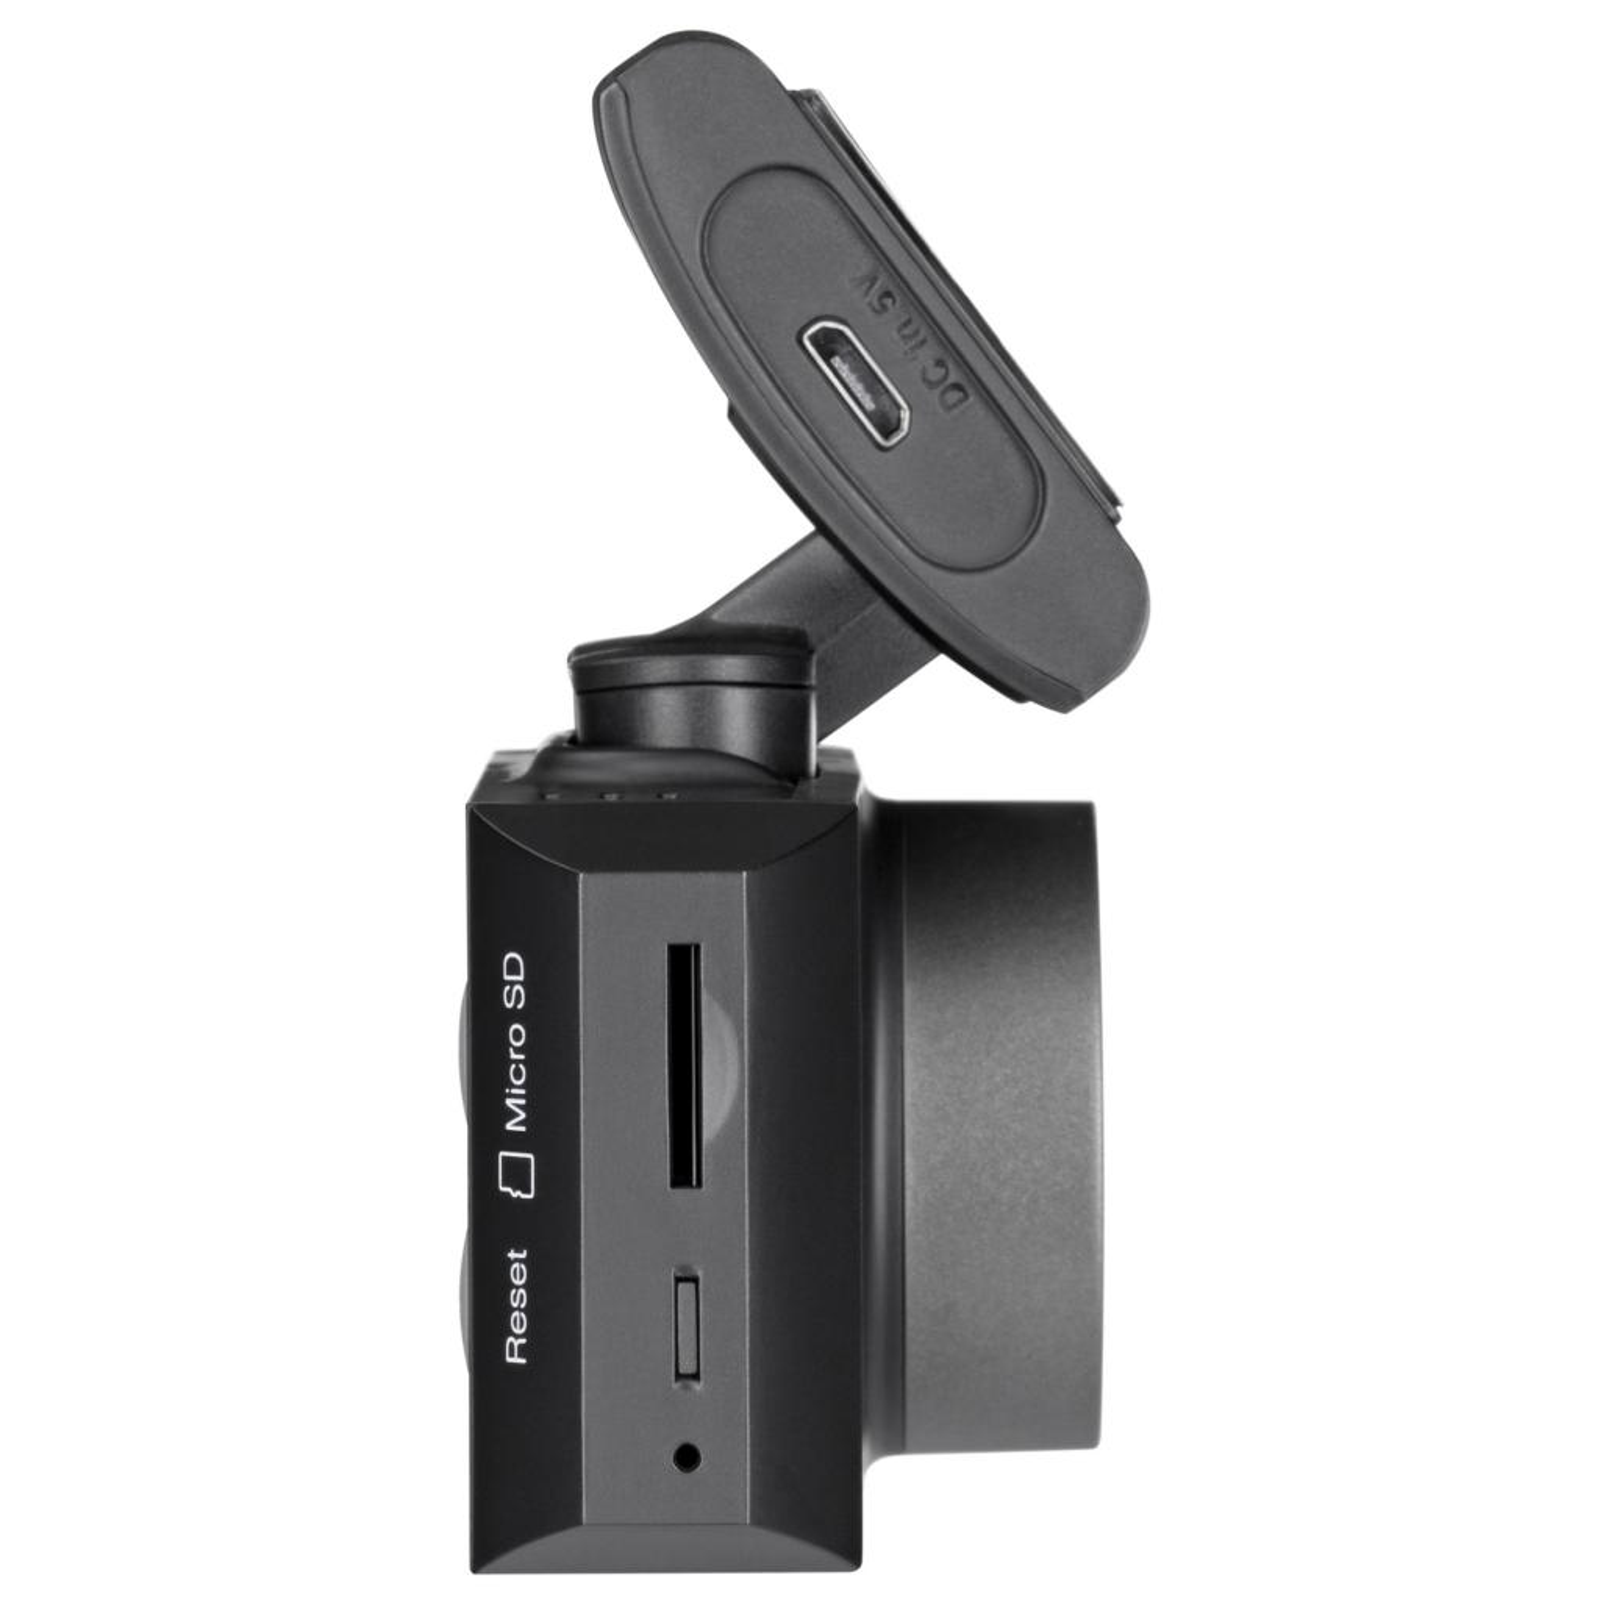 Відеореєстратор 2E Drive 700 Magnet (2E-DRIVE700MAGNET) зображення 3